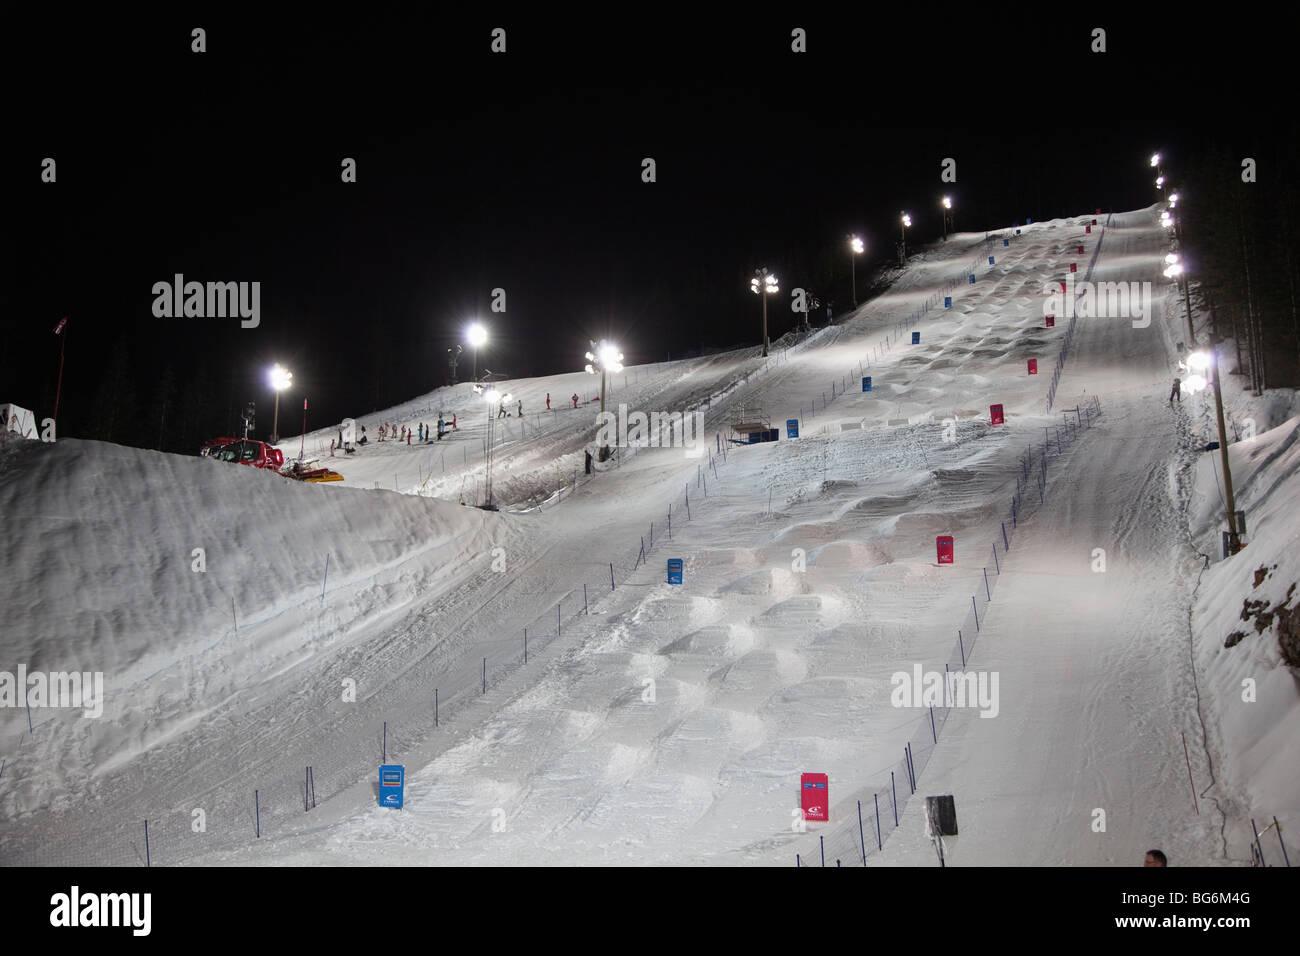 moguls run at cypress mountain ski resort, west vancouver, british